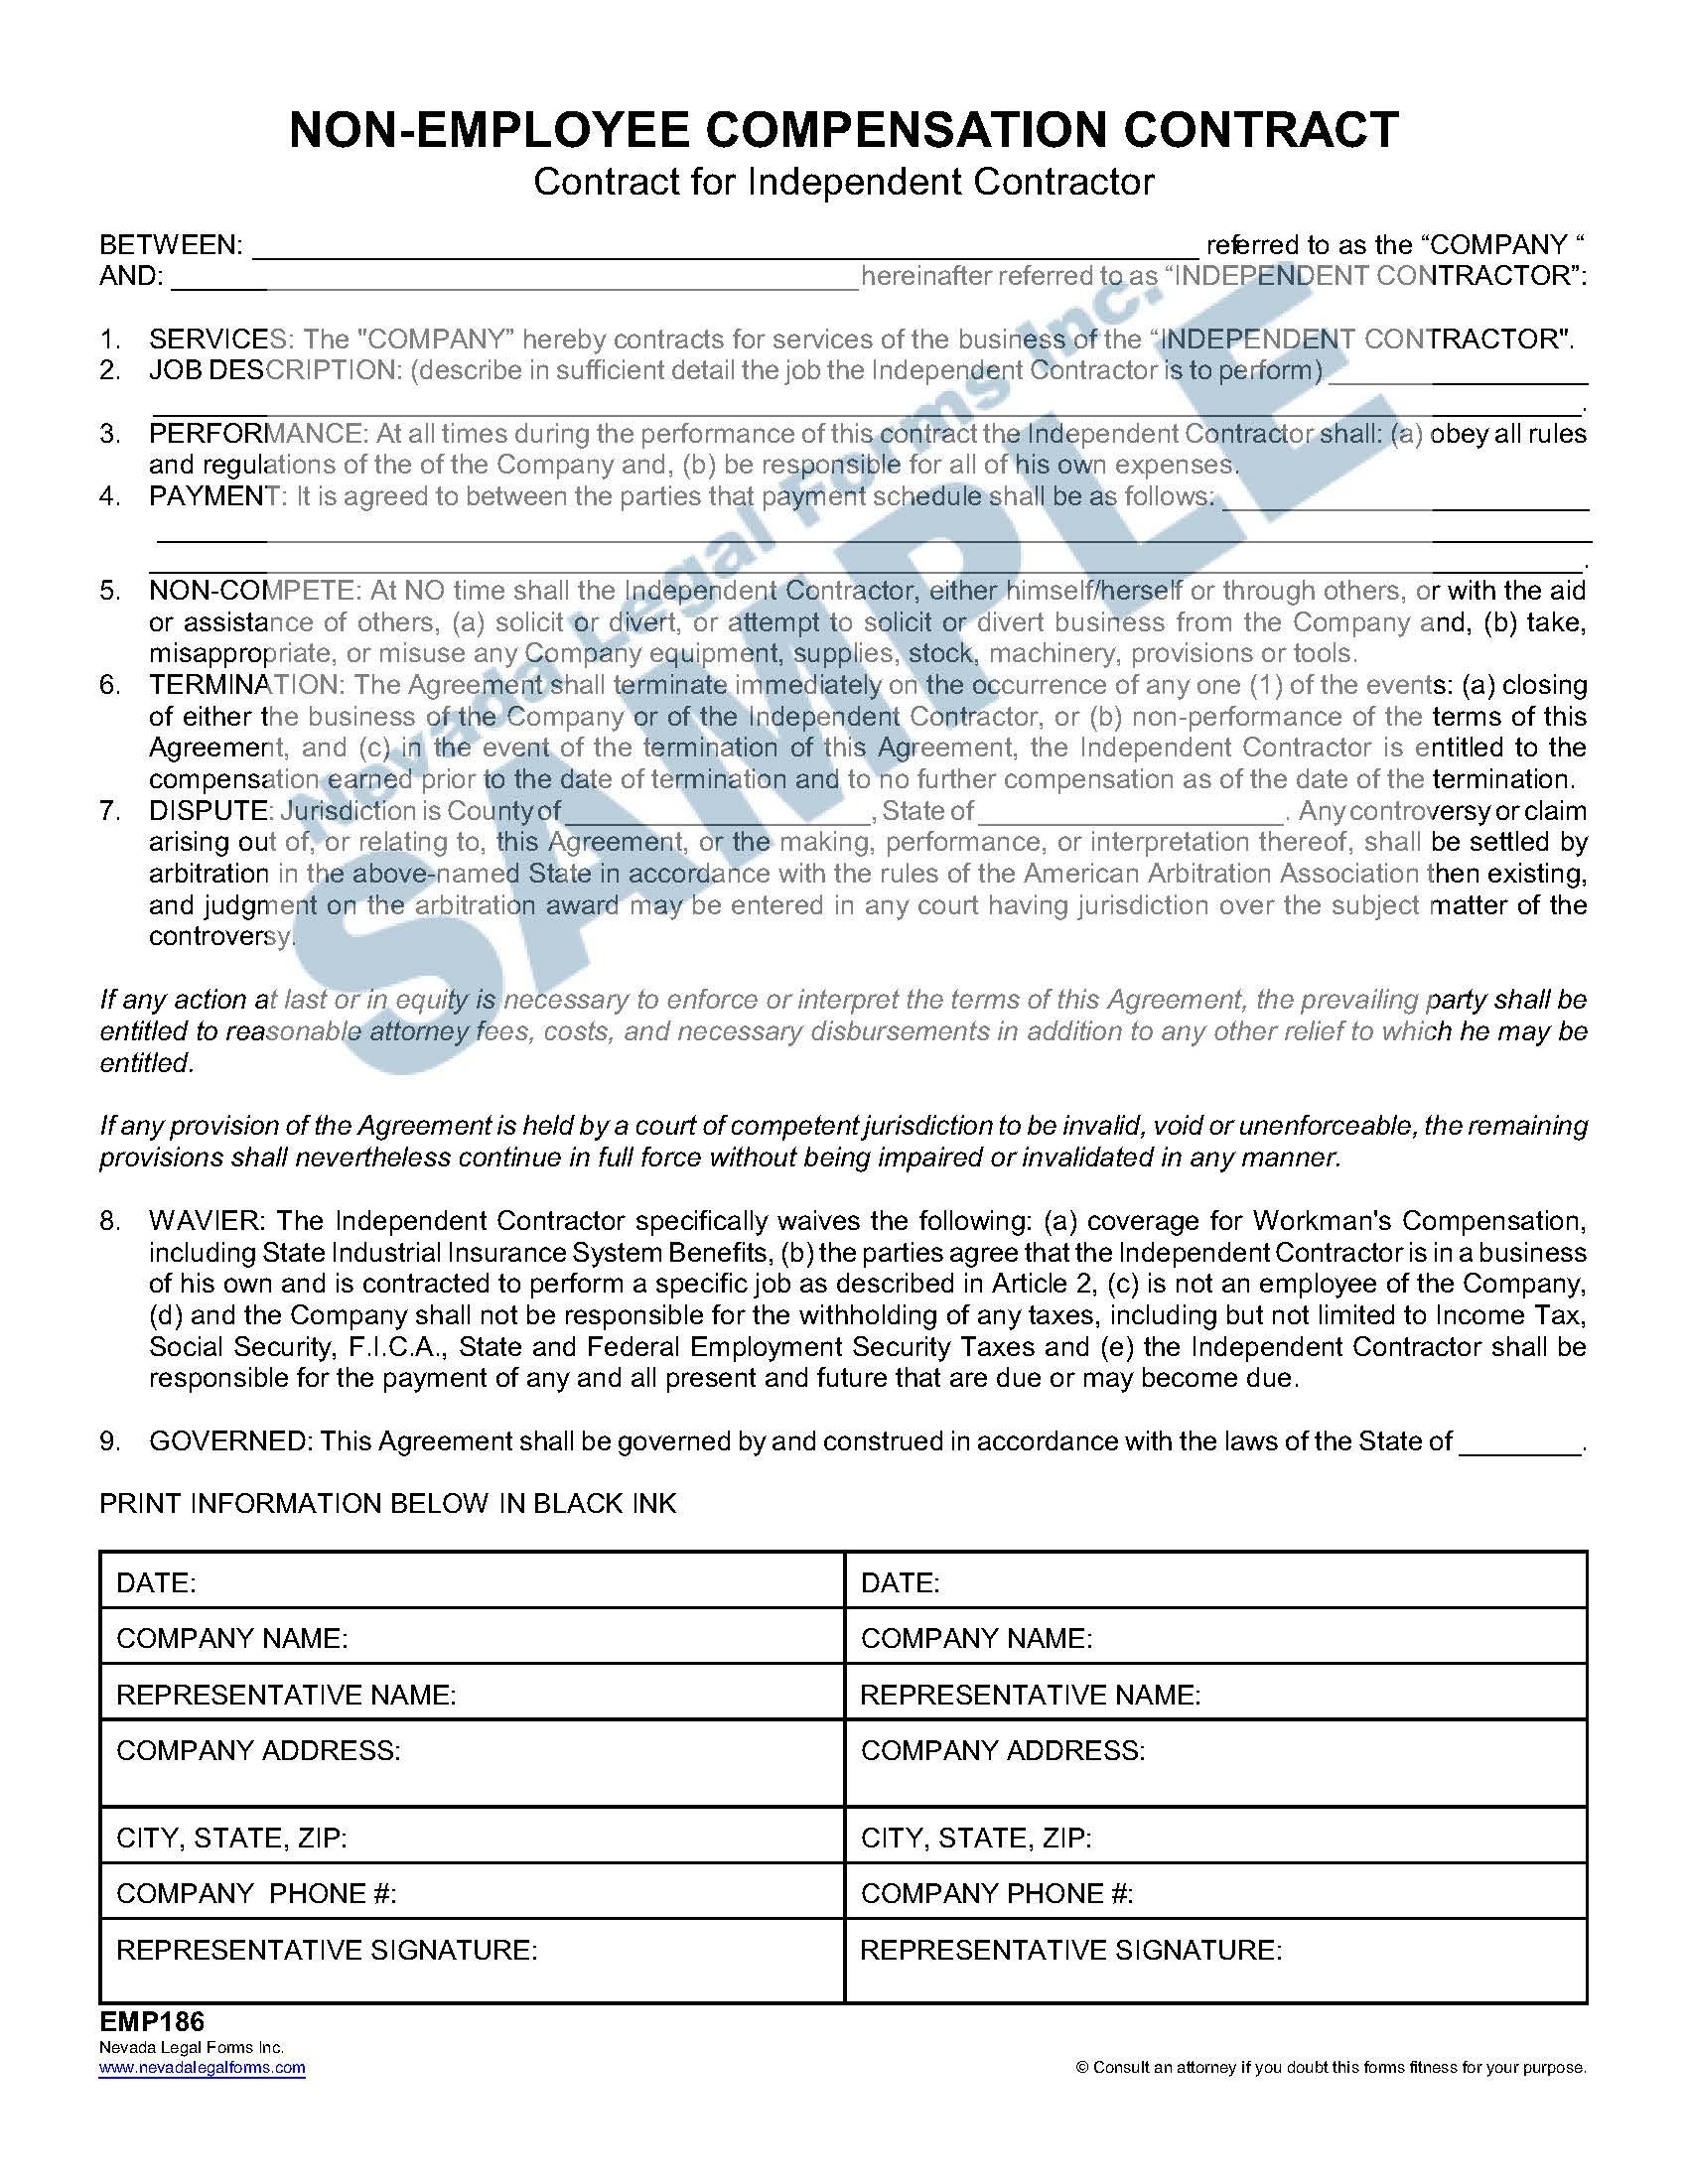 Non Employee Compensation Contract